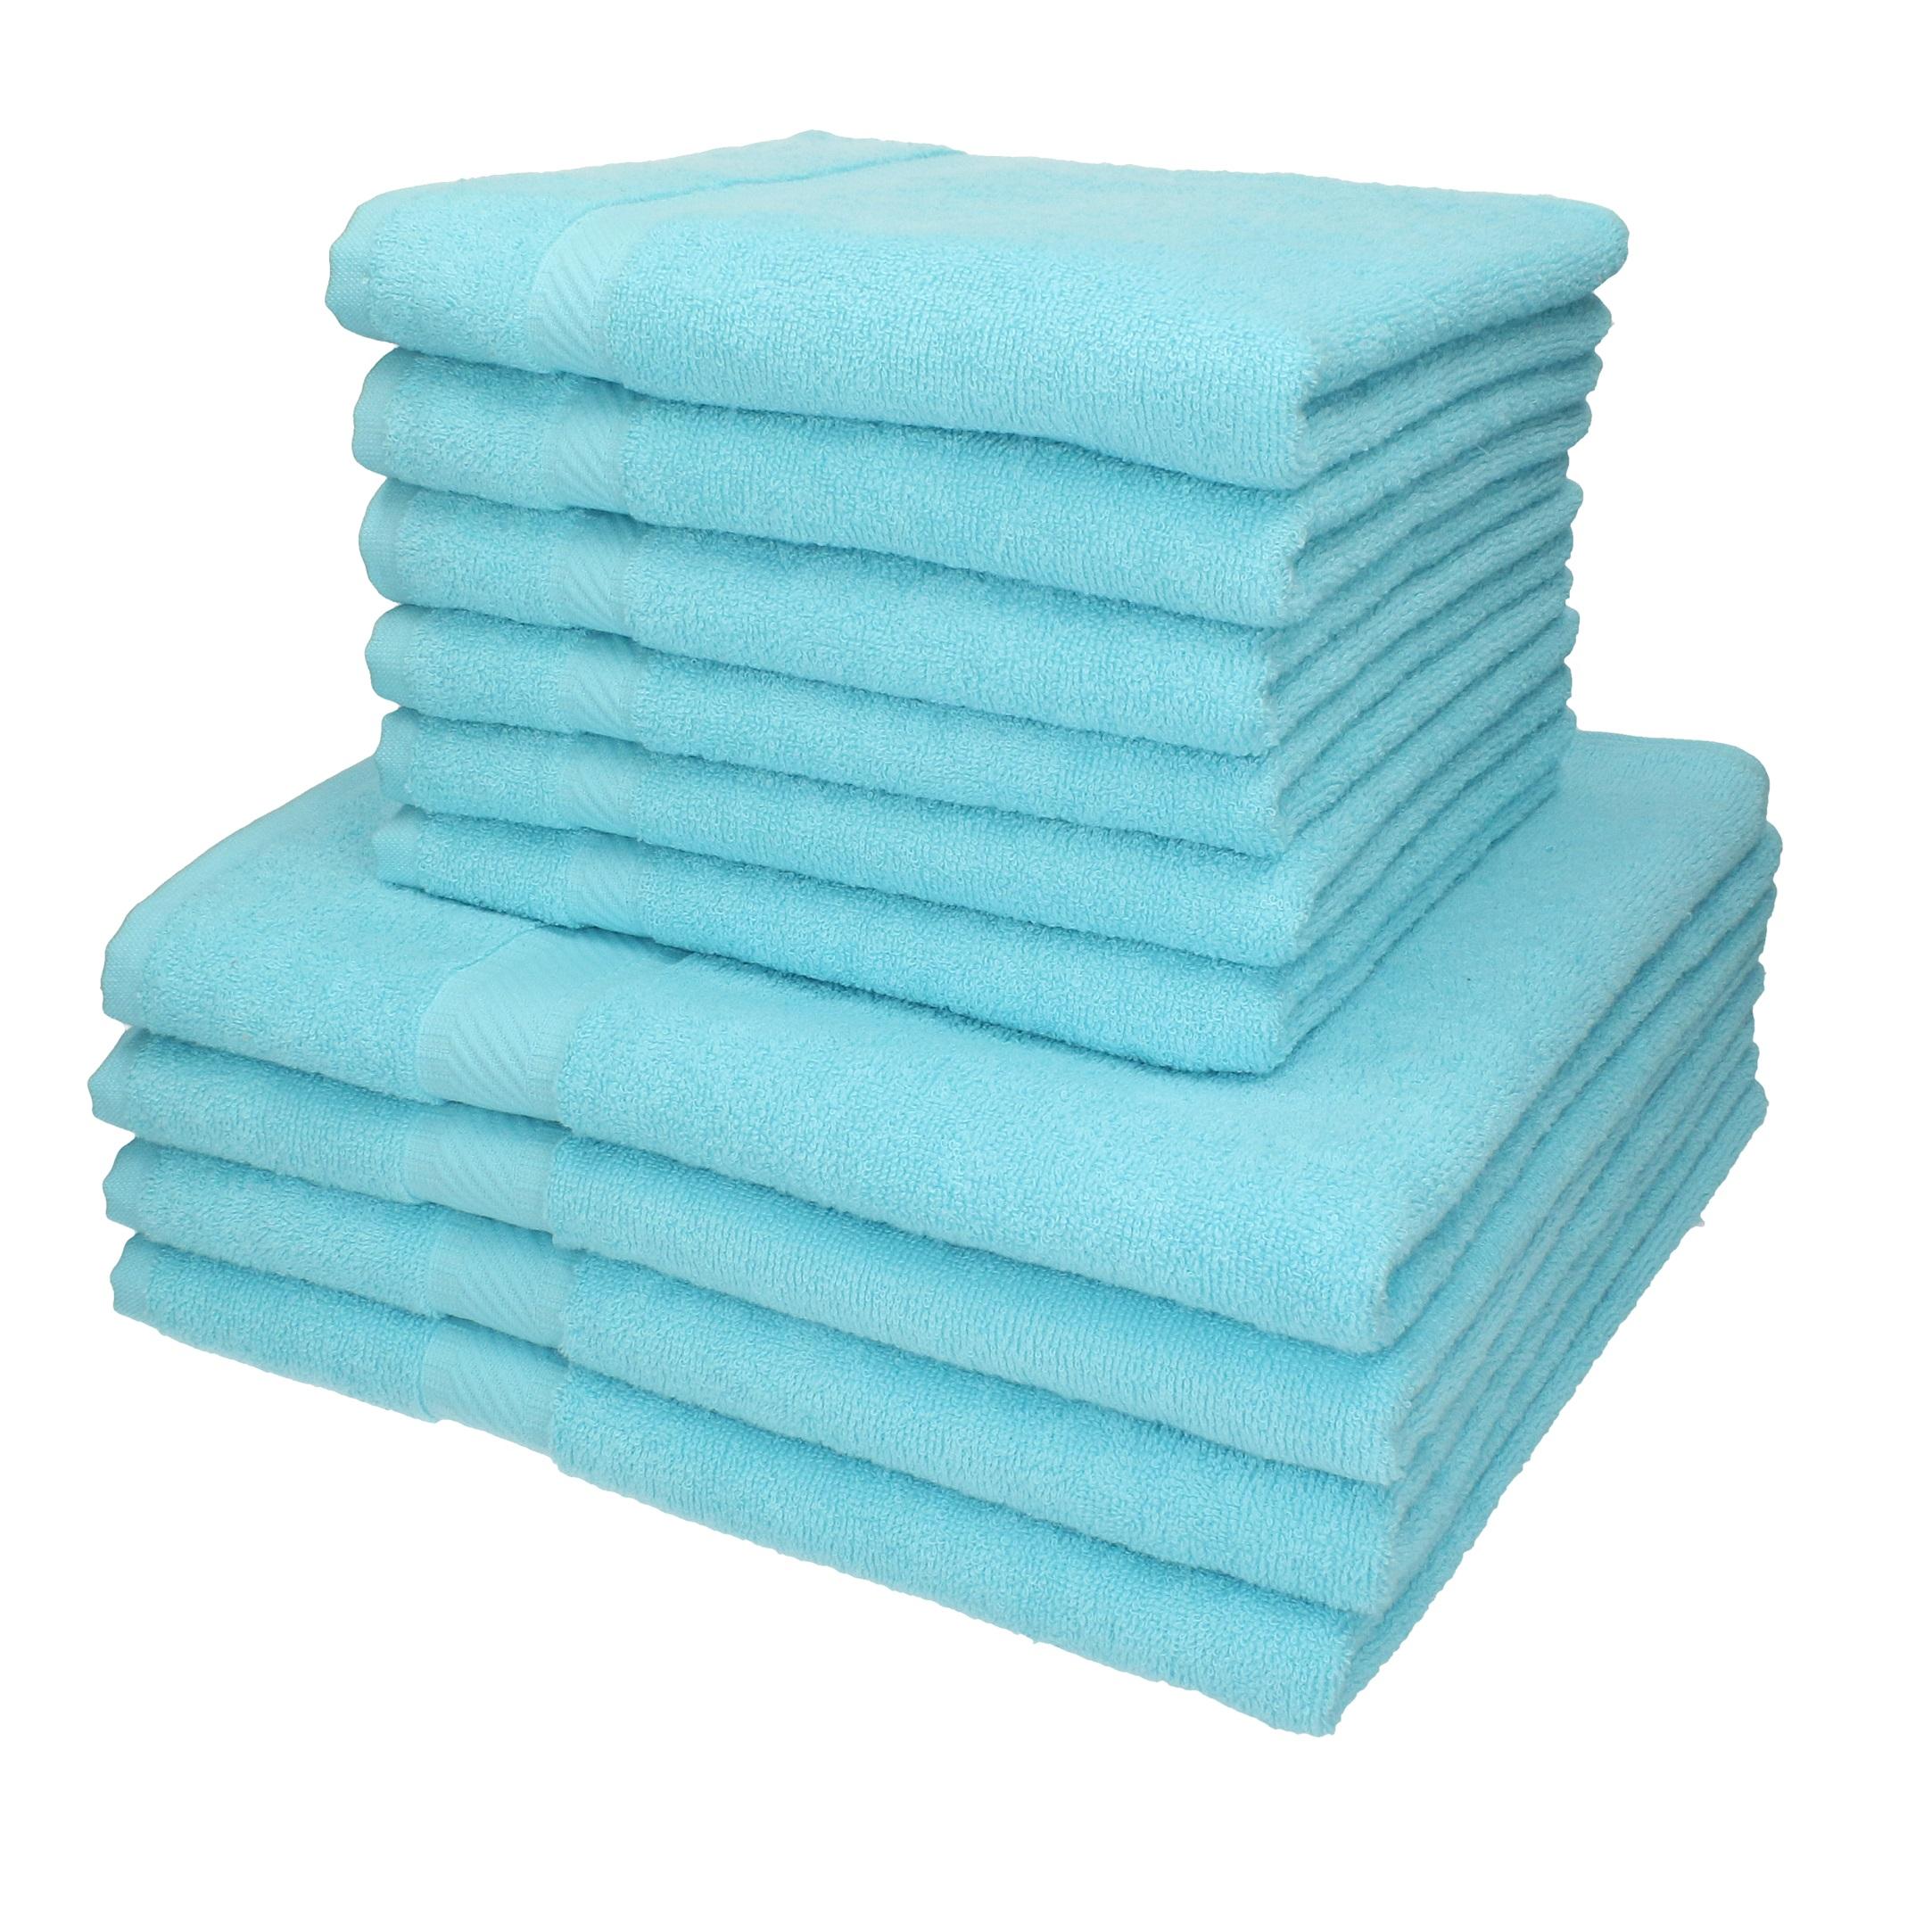 di 10 asciugamani da bagno Palermo: 6 asciugamani e 4 asciugamani da ...